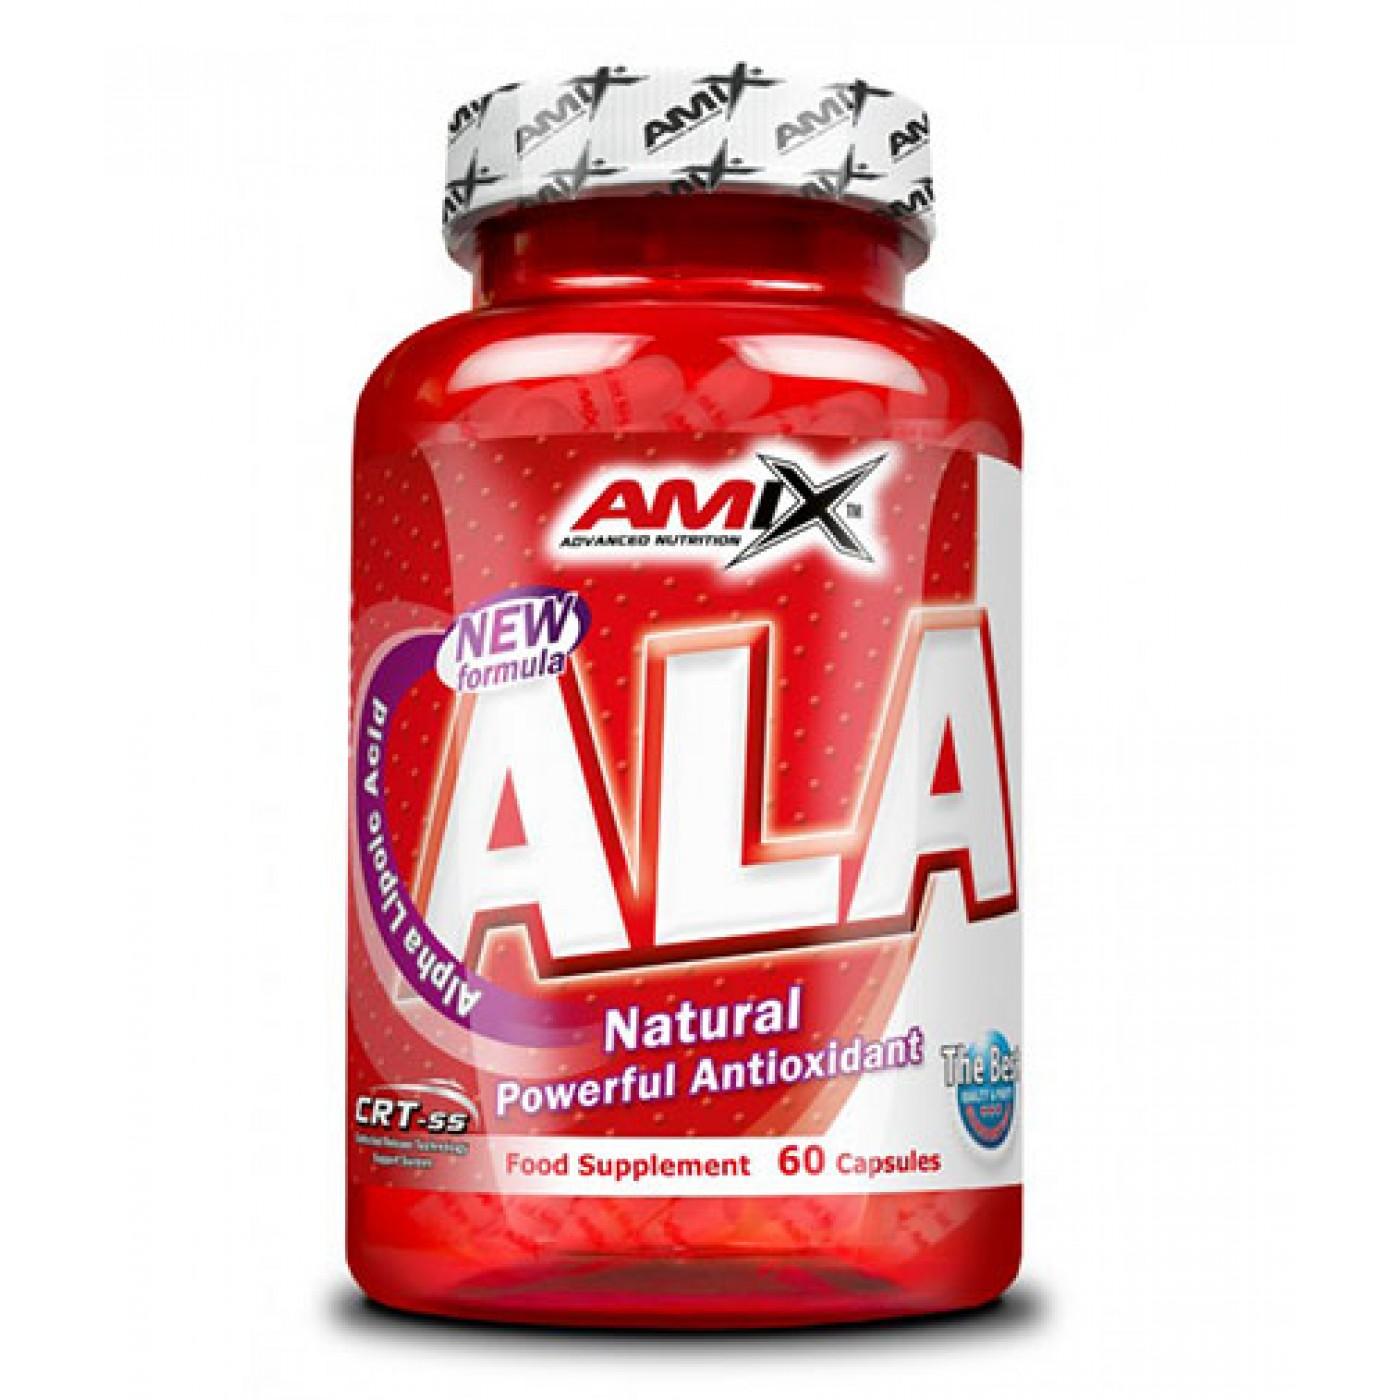 AMIX Ala (alpha Lipoic Acid)